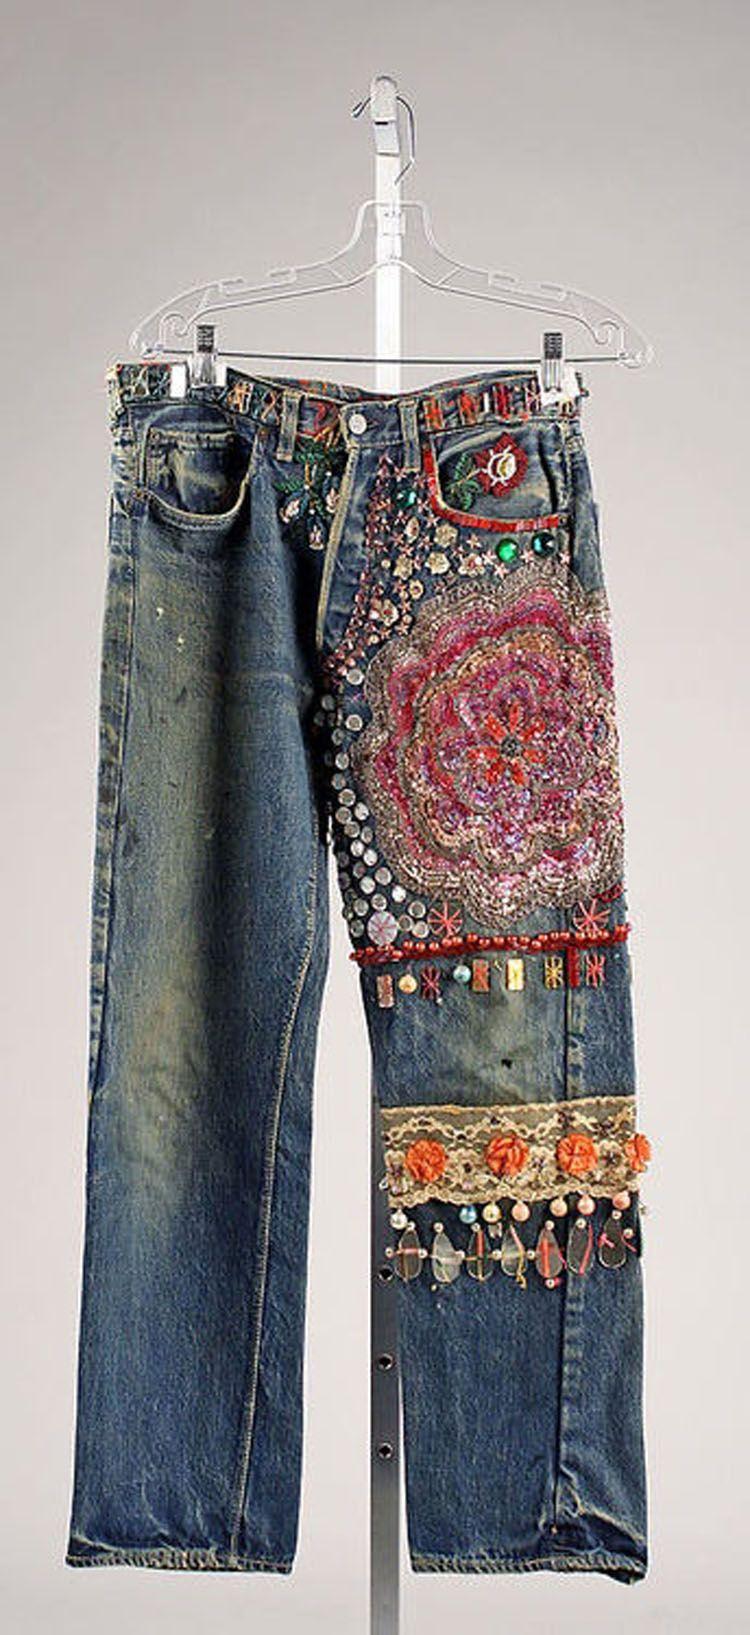 too much but inspires thought fashion pinterest jeans kleider und hosen. Black Bedroom Furniture Sets. Home Design Ideas